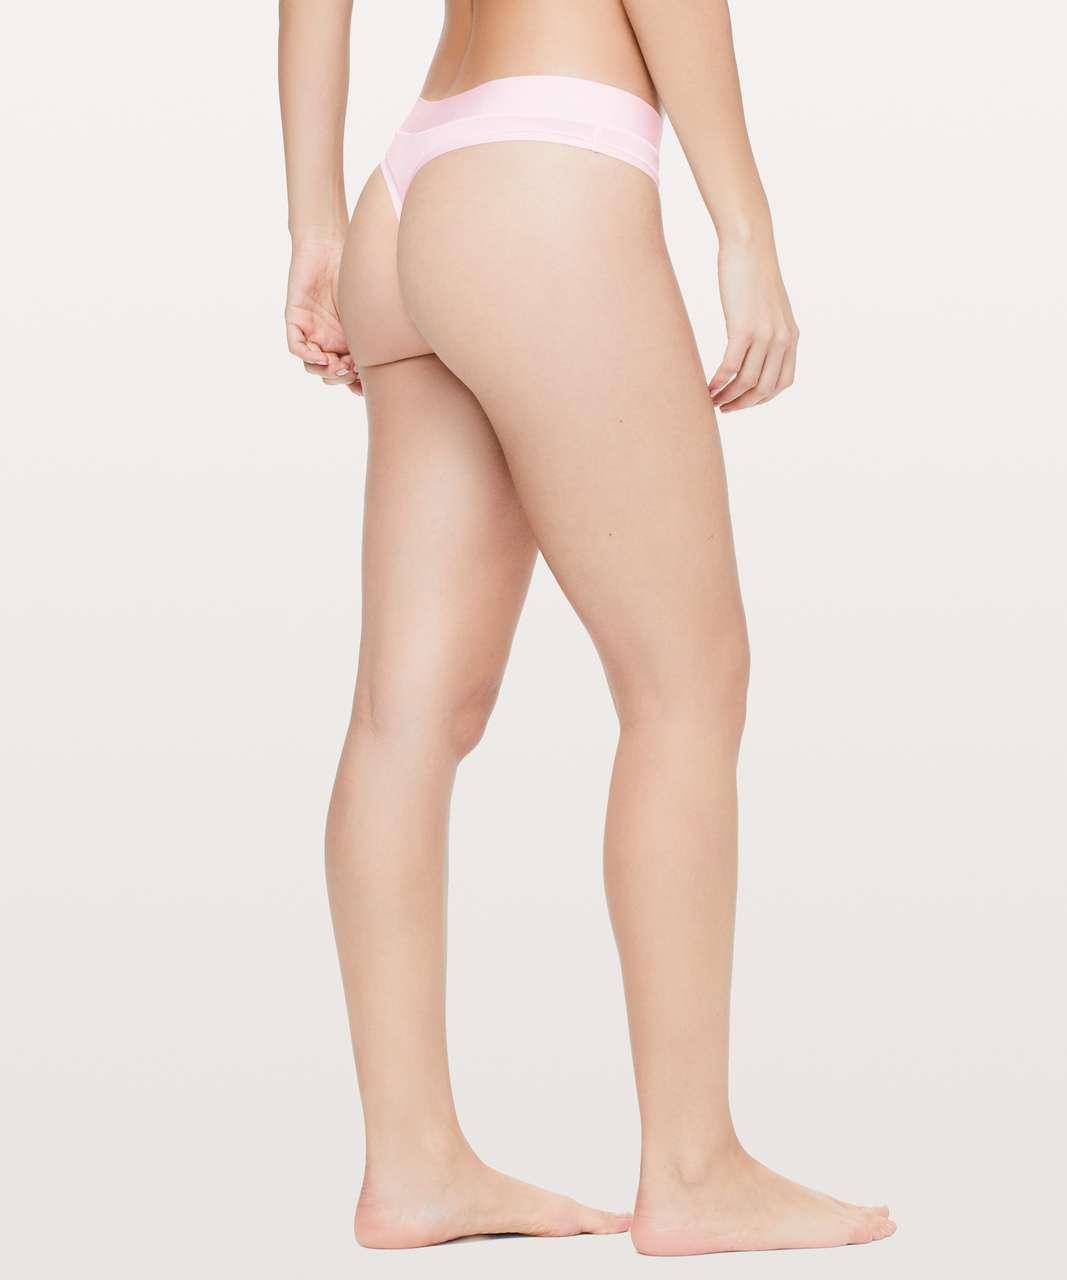 Lululemon Mula Bandhawear Thong - Blissful Pink